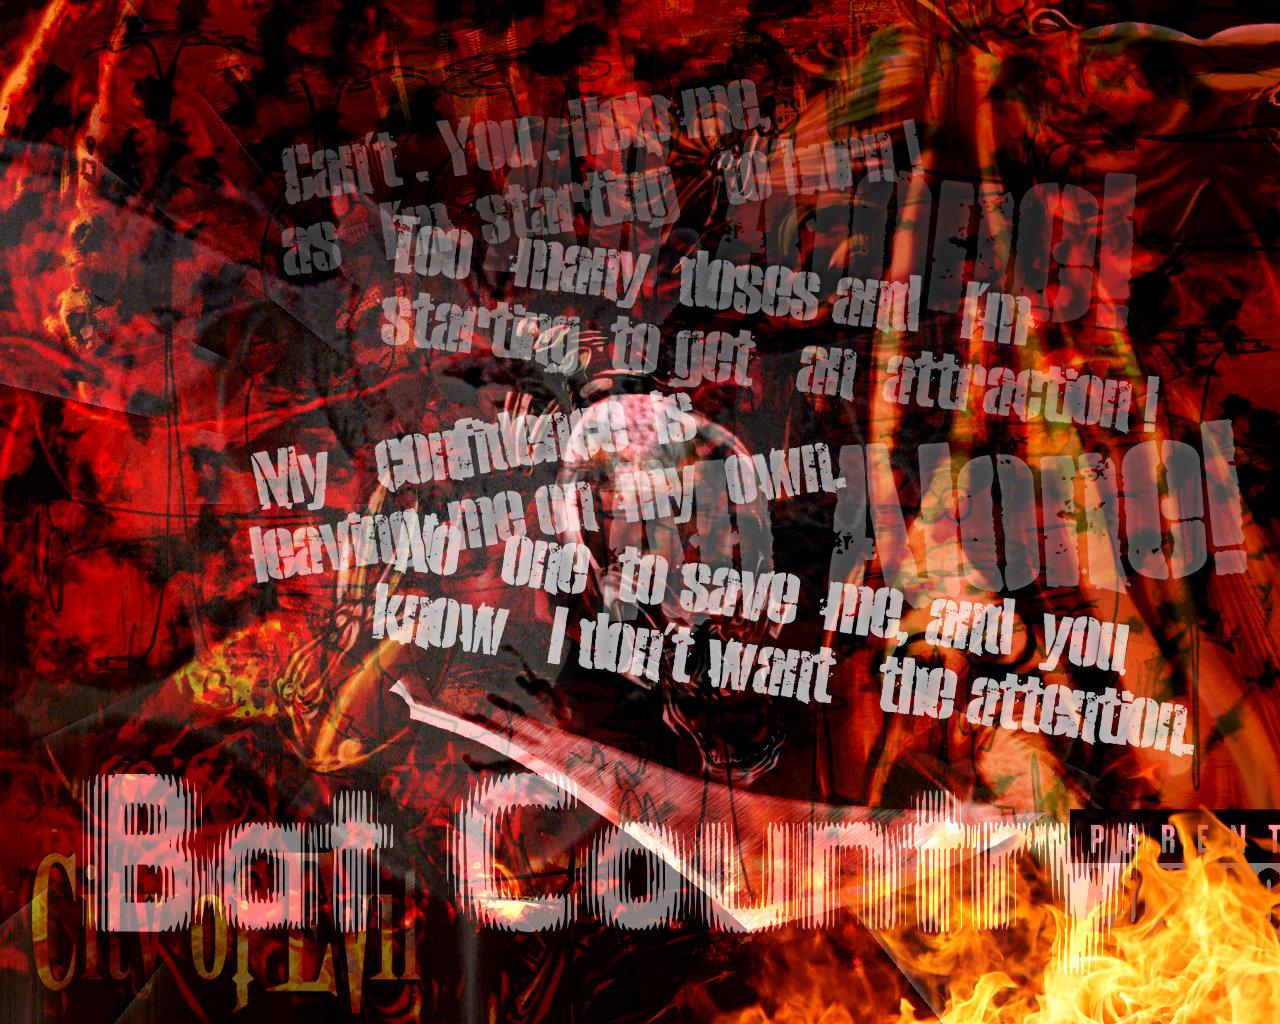 Cool Wallpaper Music Country - VXNoWA  Image_659679.jpg